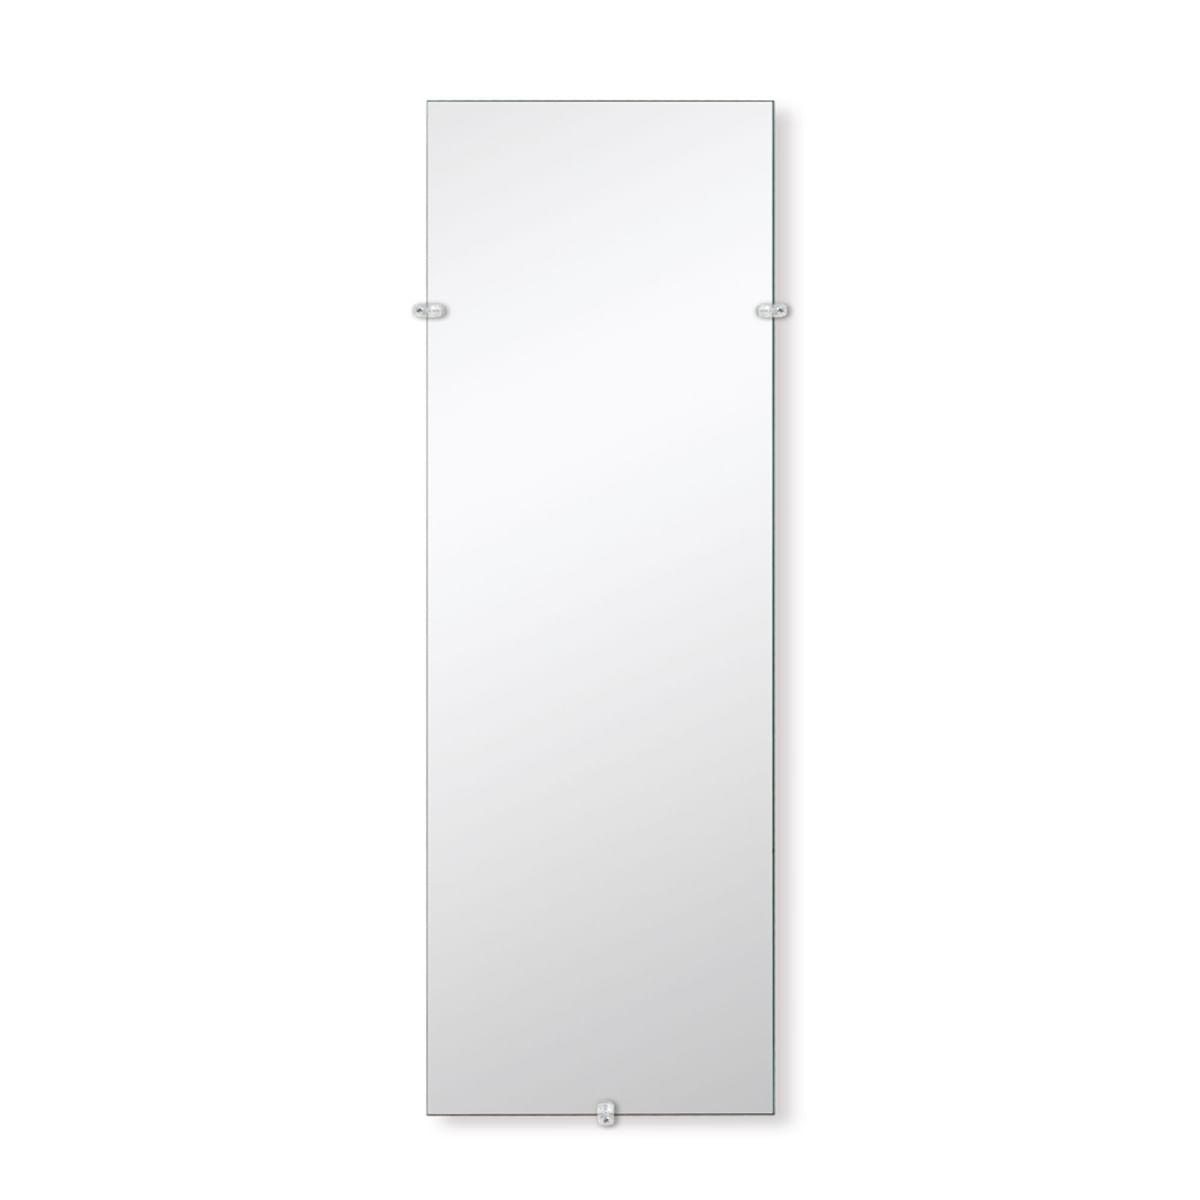 espejo-placard-borde-pulido